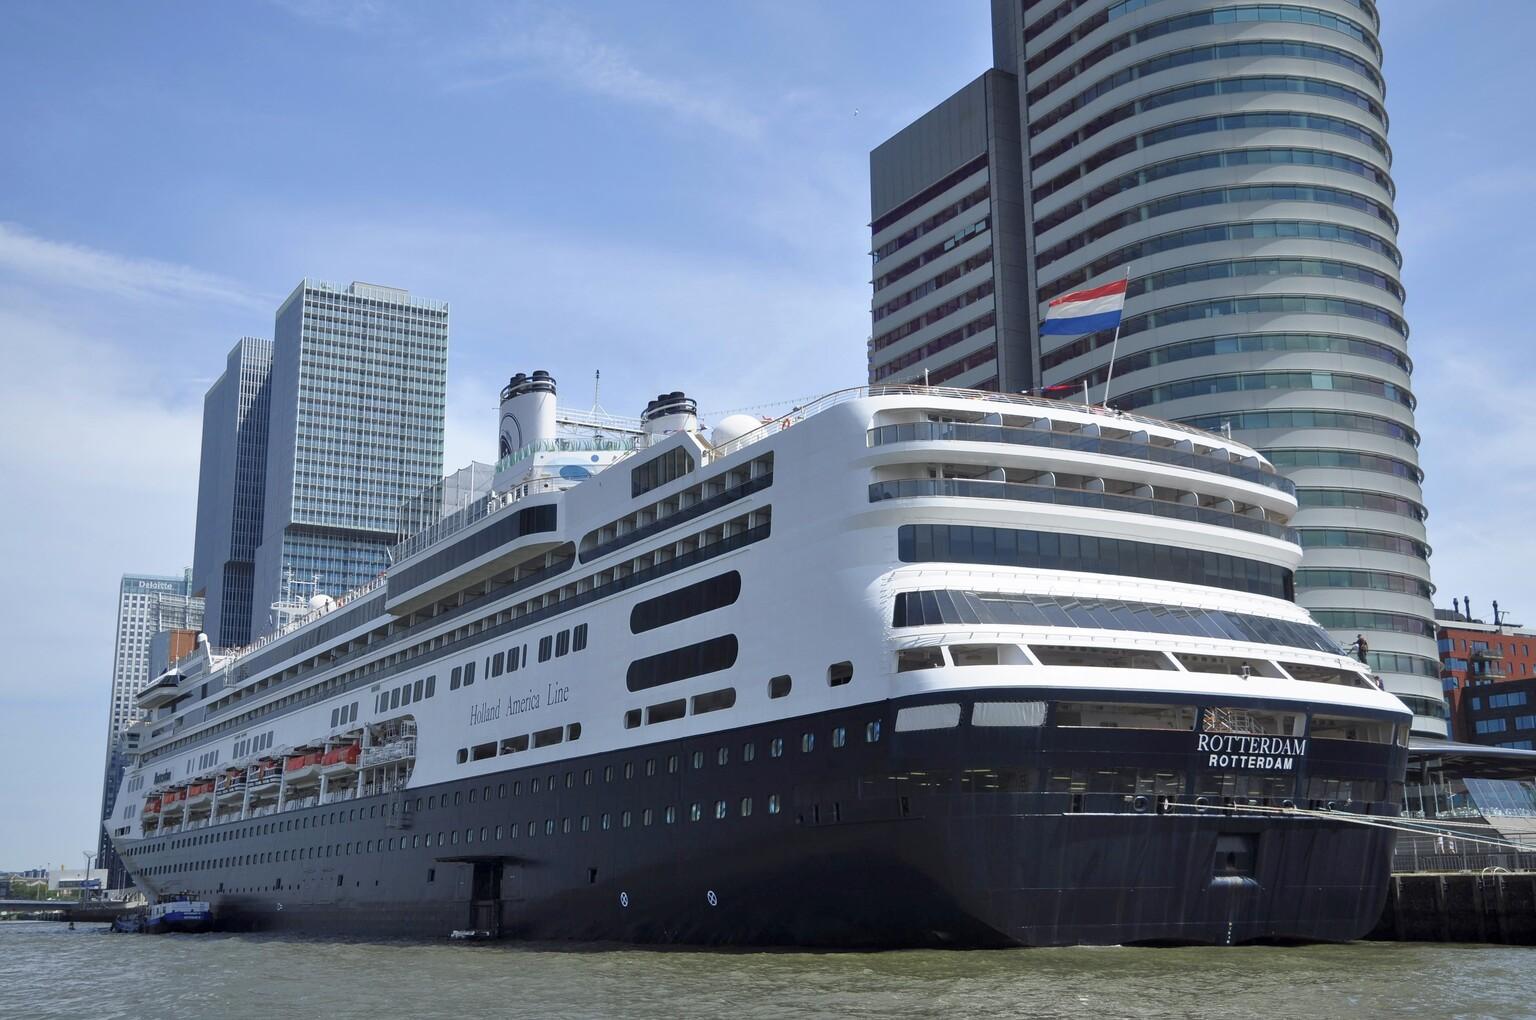 Schip - ms Rotterdam - foto door mploeg-2701 op 14-04-2021 - locatie: Rotterdam, Nederland - deze foto bevat: water, lucht, wolk, gebouw, boot, wolkenkrabber, waterscooters, naval architectuur, voertuig, cruiseferry